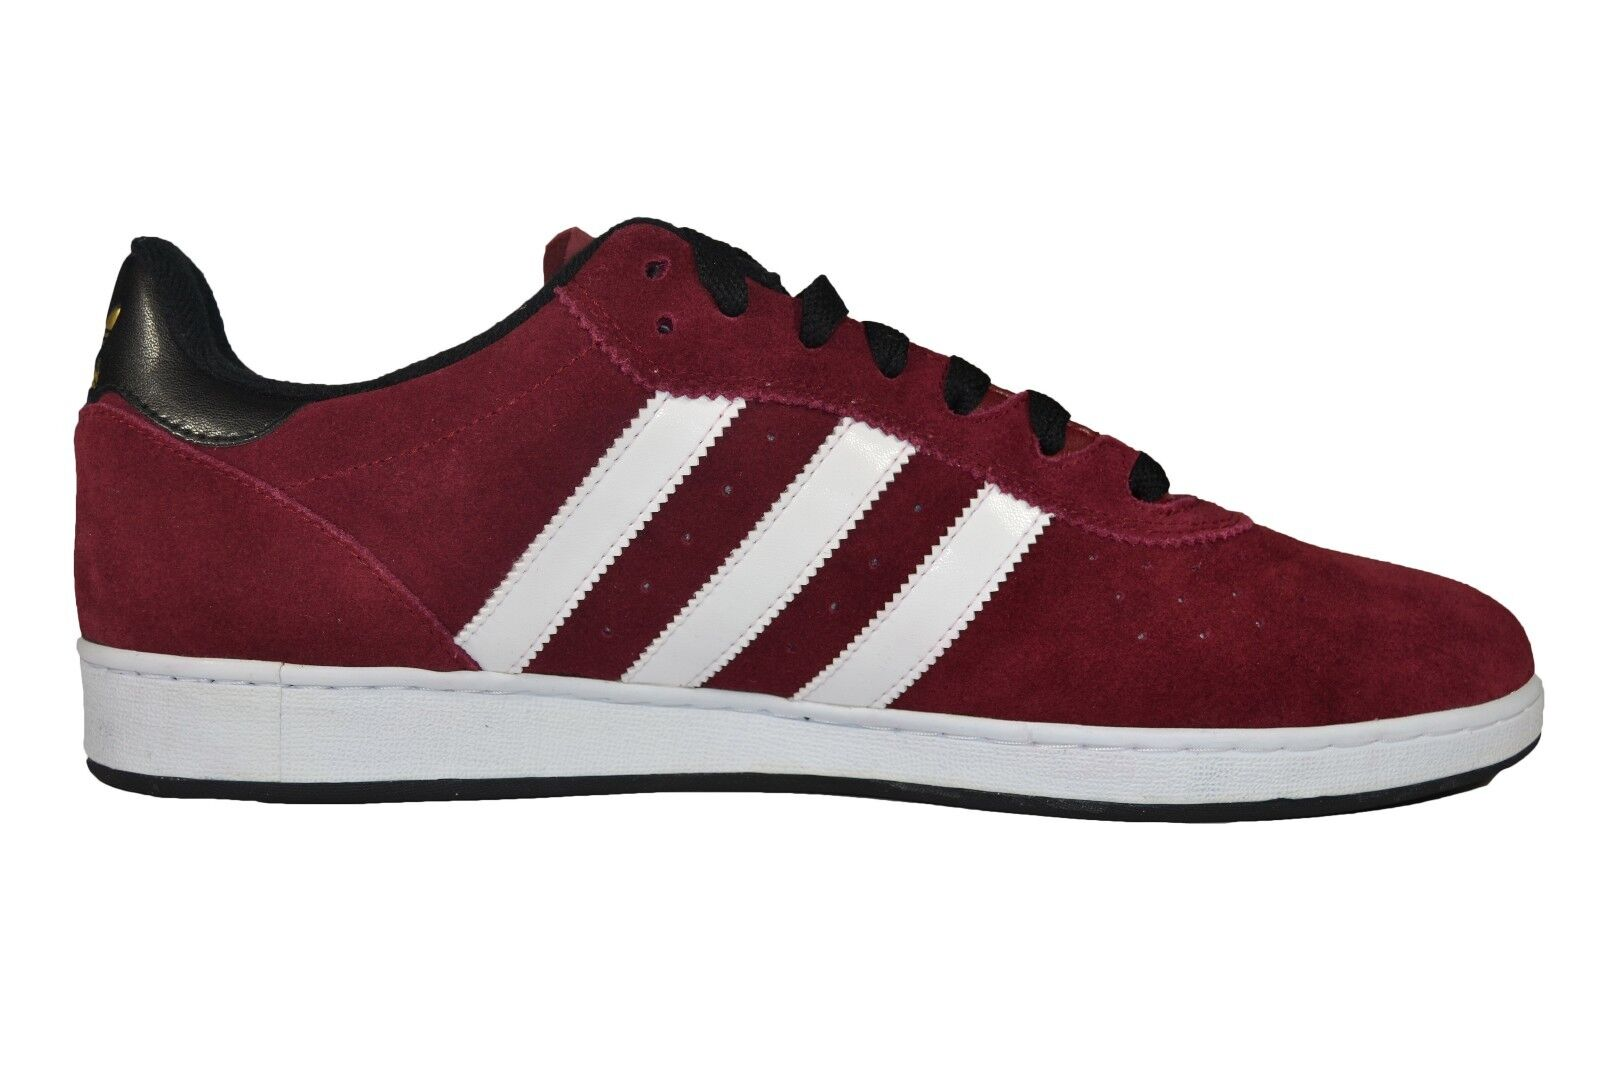 Adidas ronan eldridge skate in bianco nero cardinale skate eldridge (185), scarpe da uomo a8953b